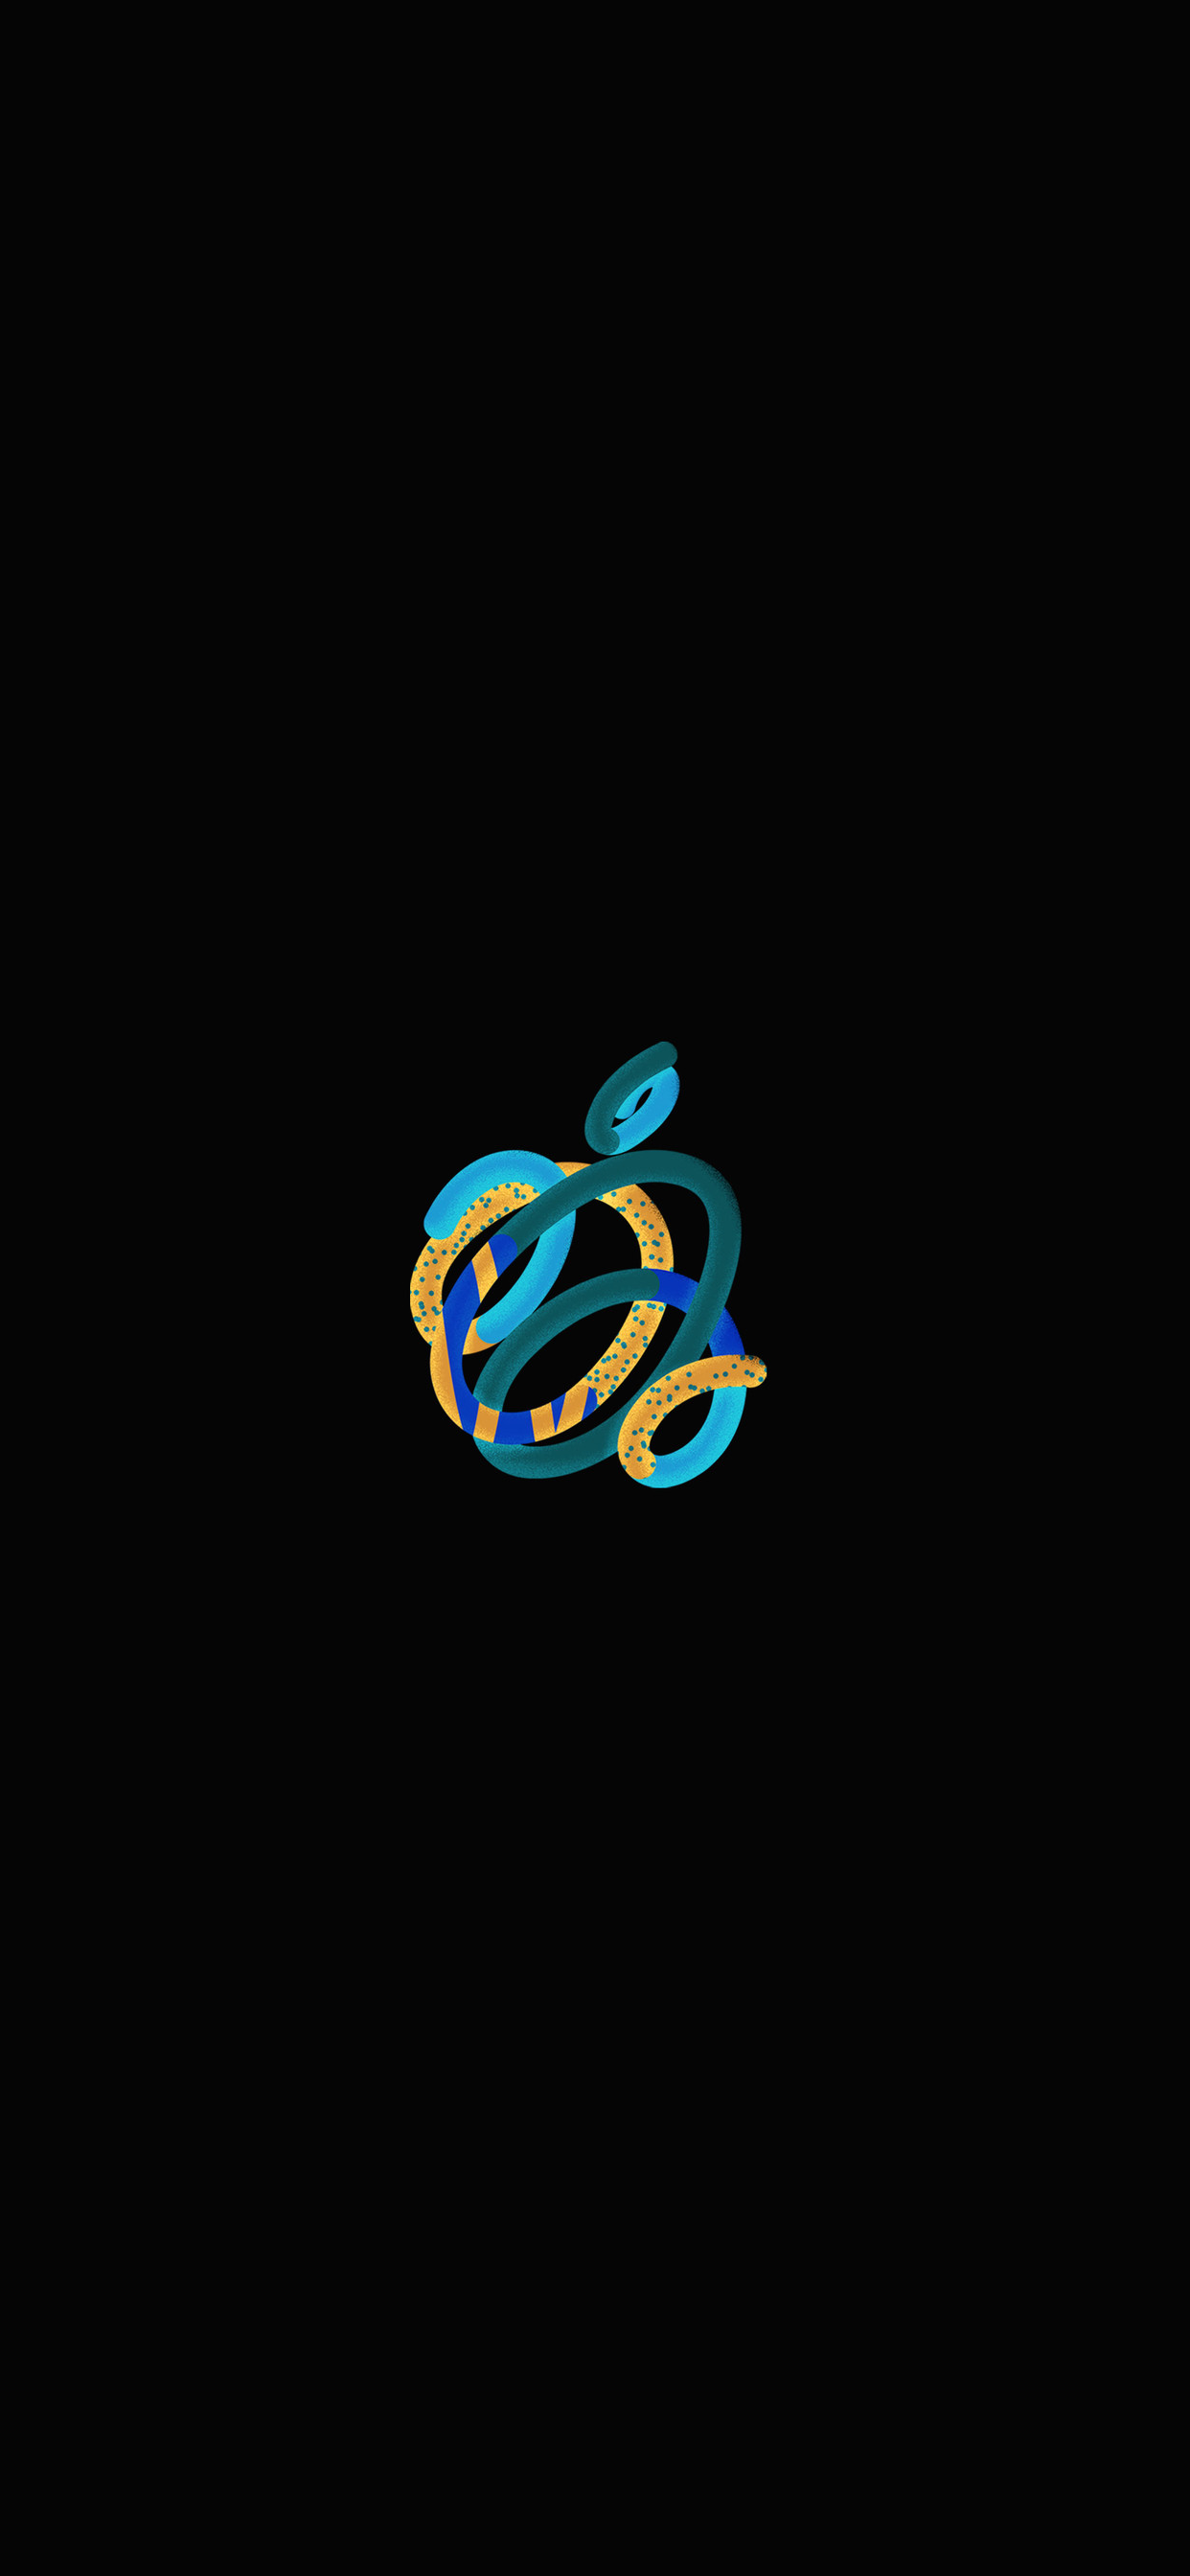 Download 6000 Wallpaper Apple Logo Phone HD Paling Keren